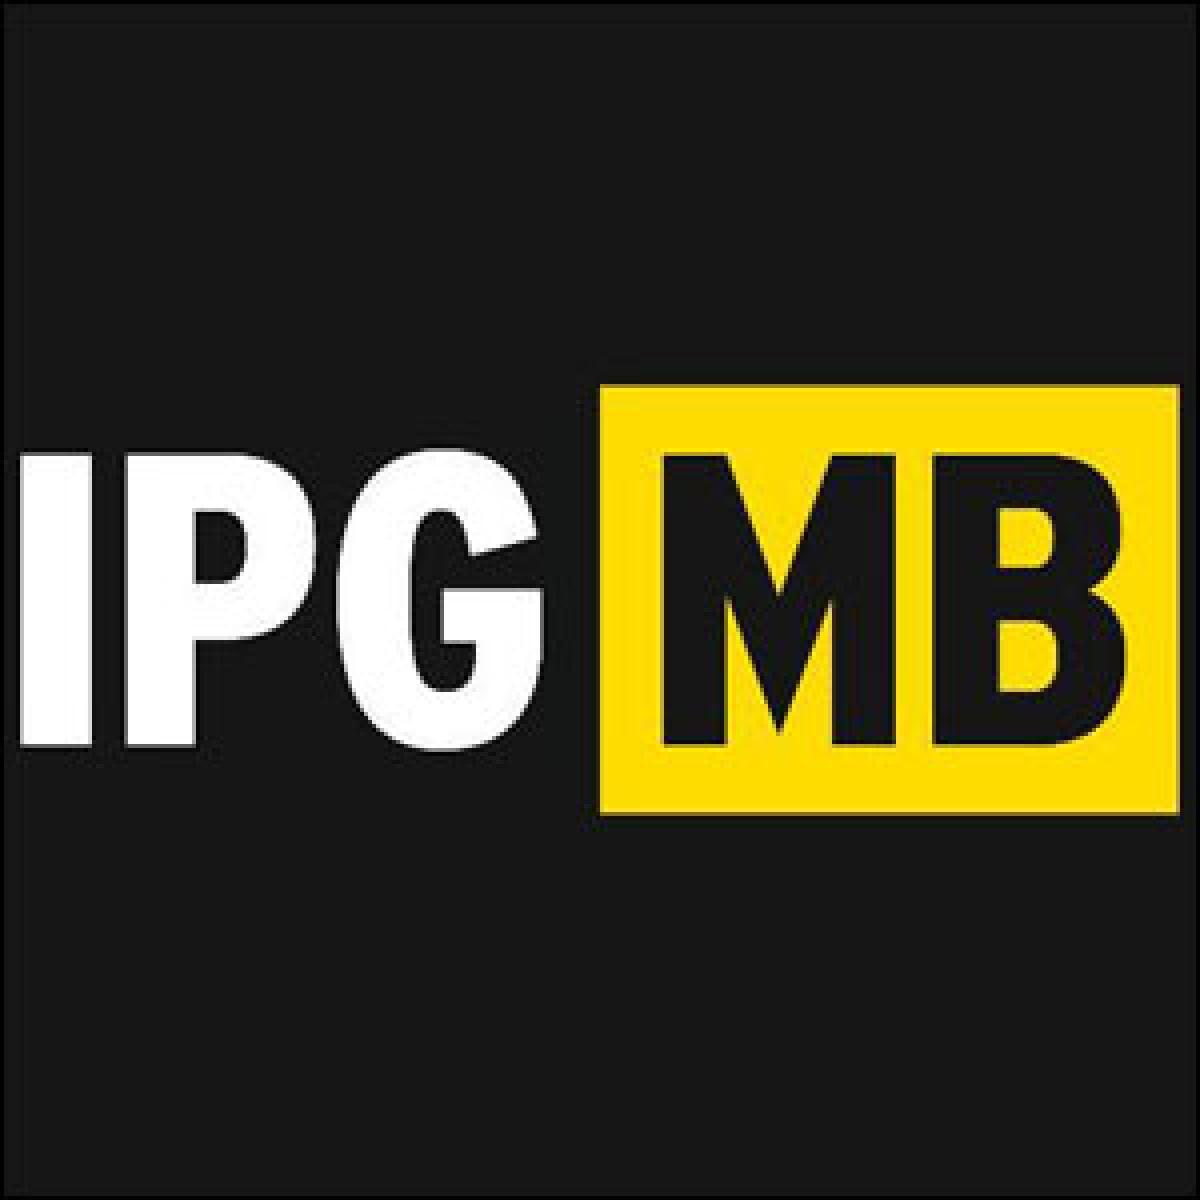 IPG Mediabrands retains media duties of Reckitt Benckiser in India